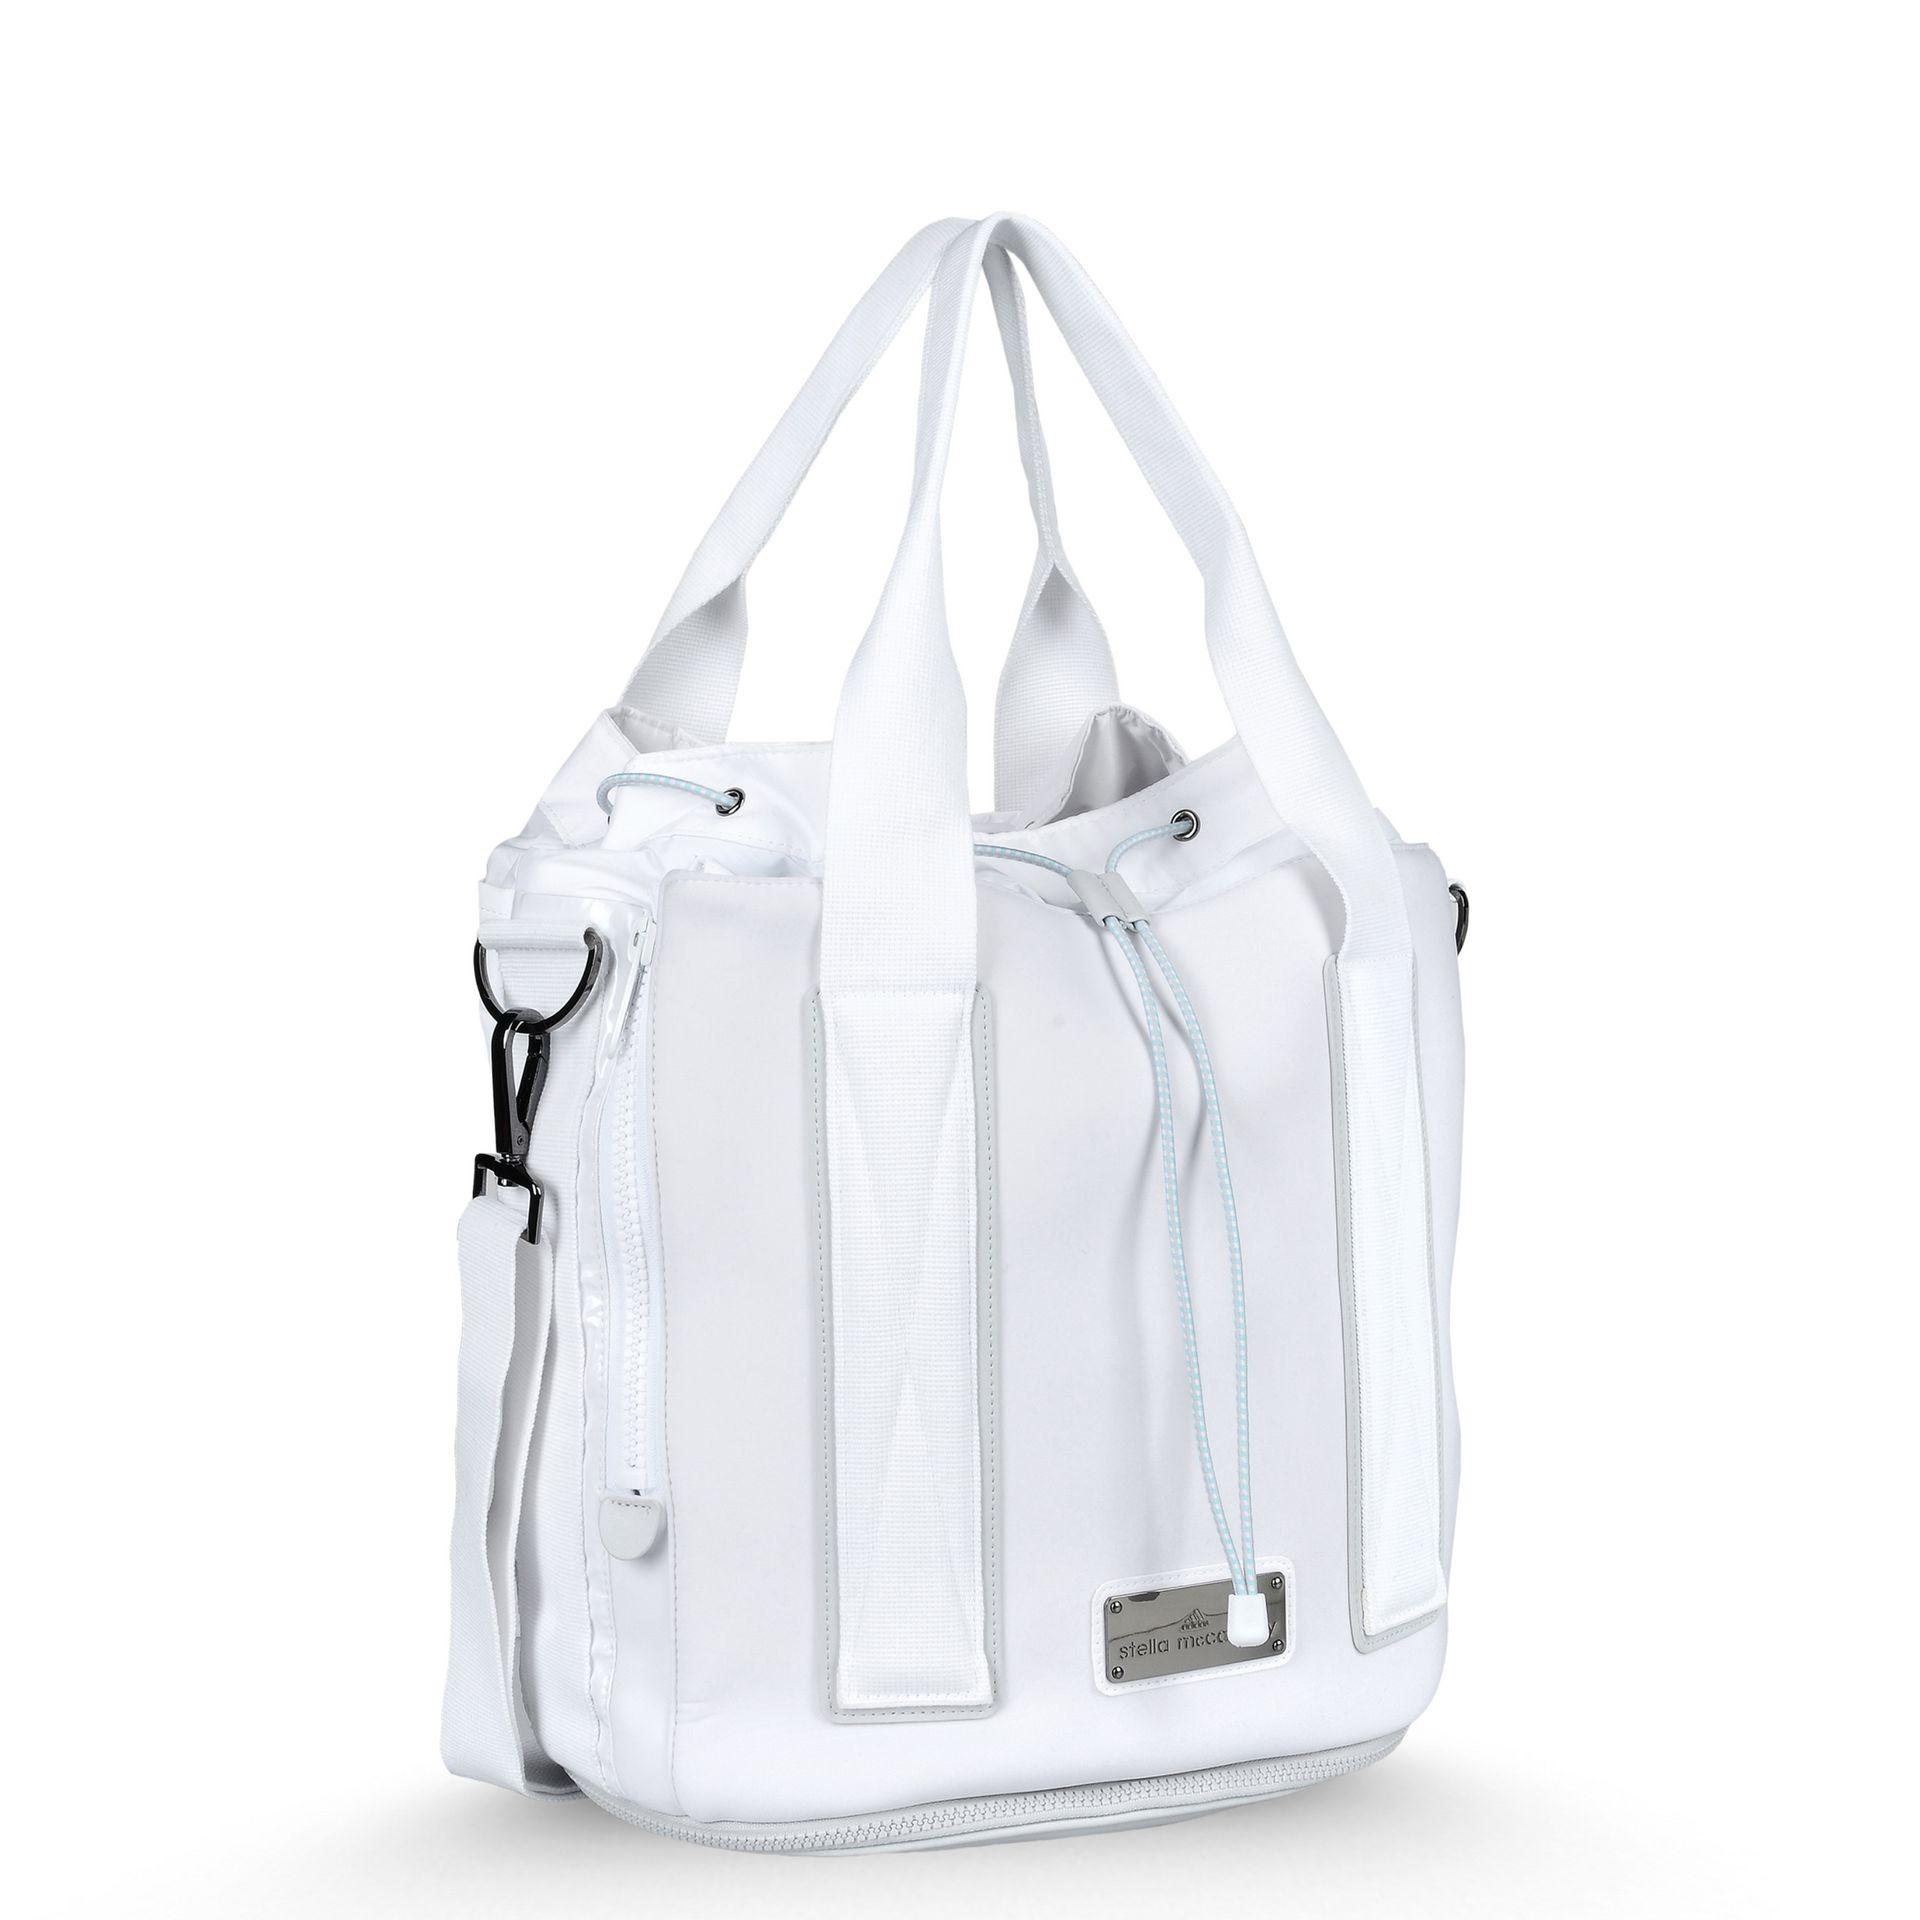 Lyst Stella Mccartney Tennis Bag In White